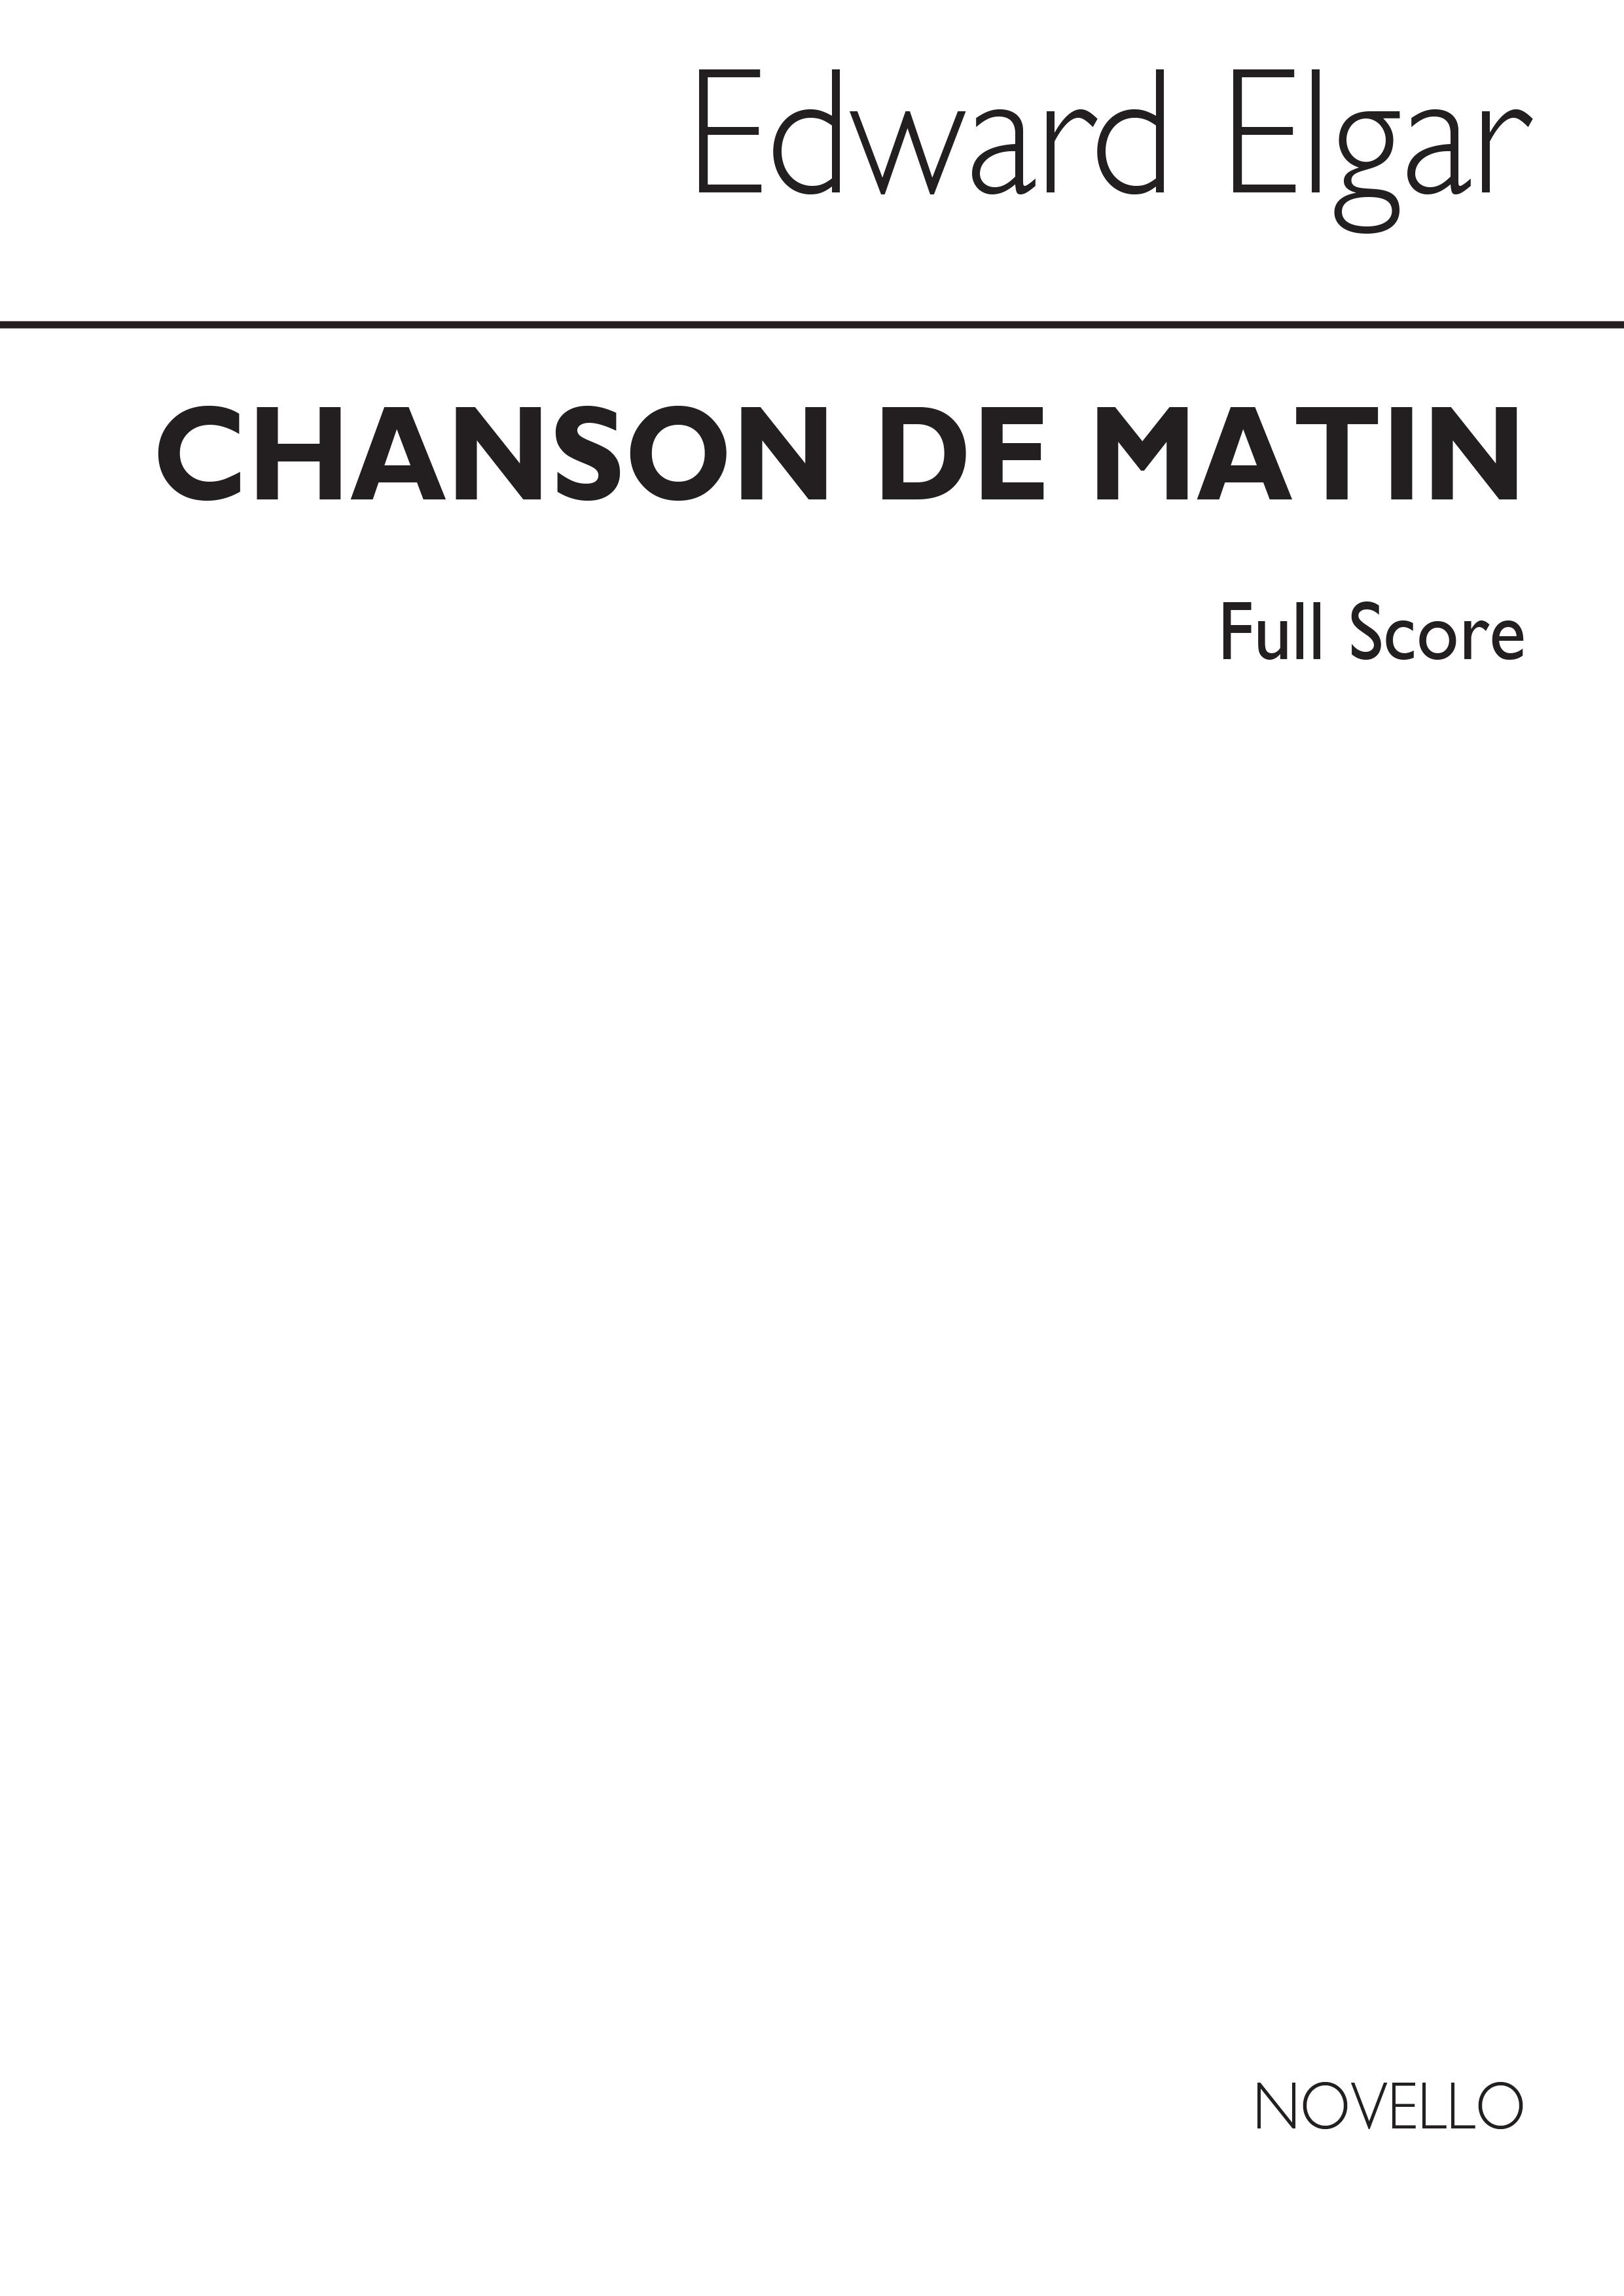 Edward Elgar: Chanson De Matin (Full Score): Orchestra: Score